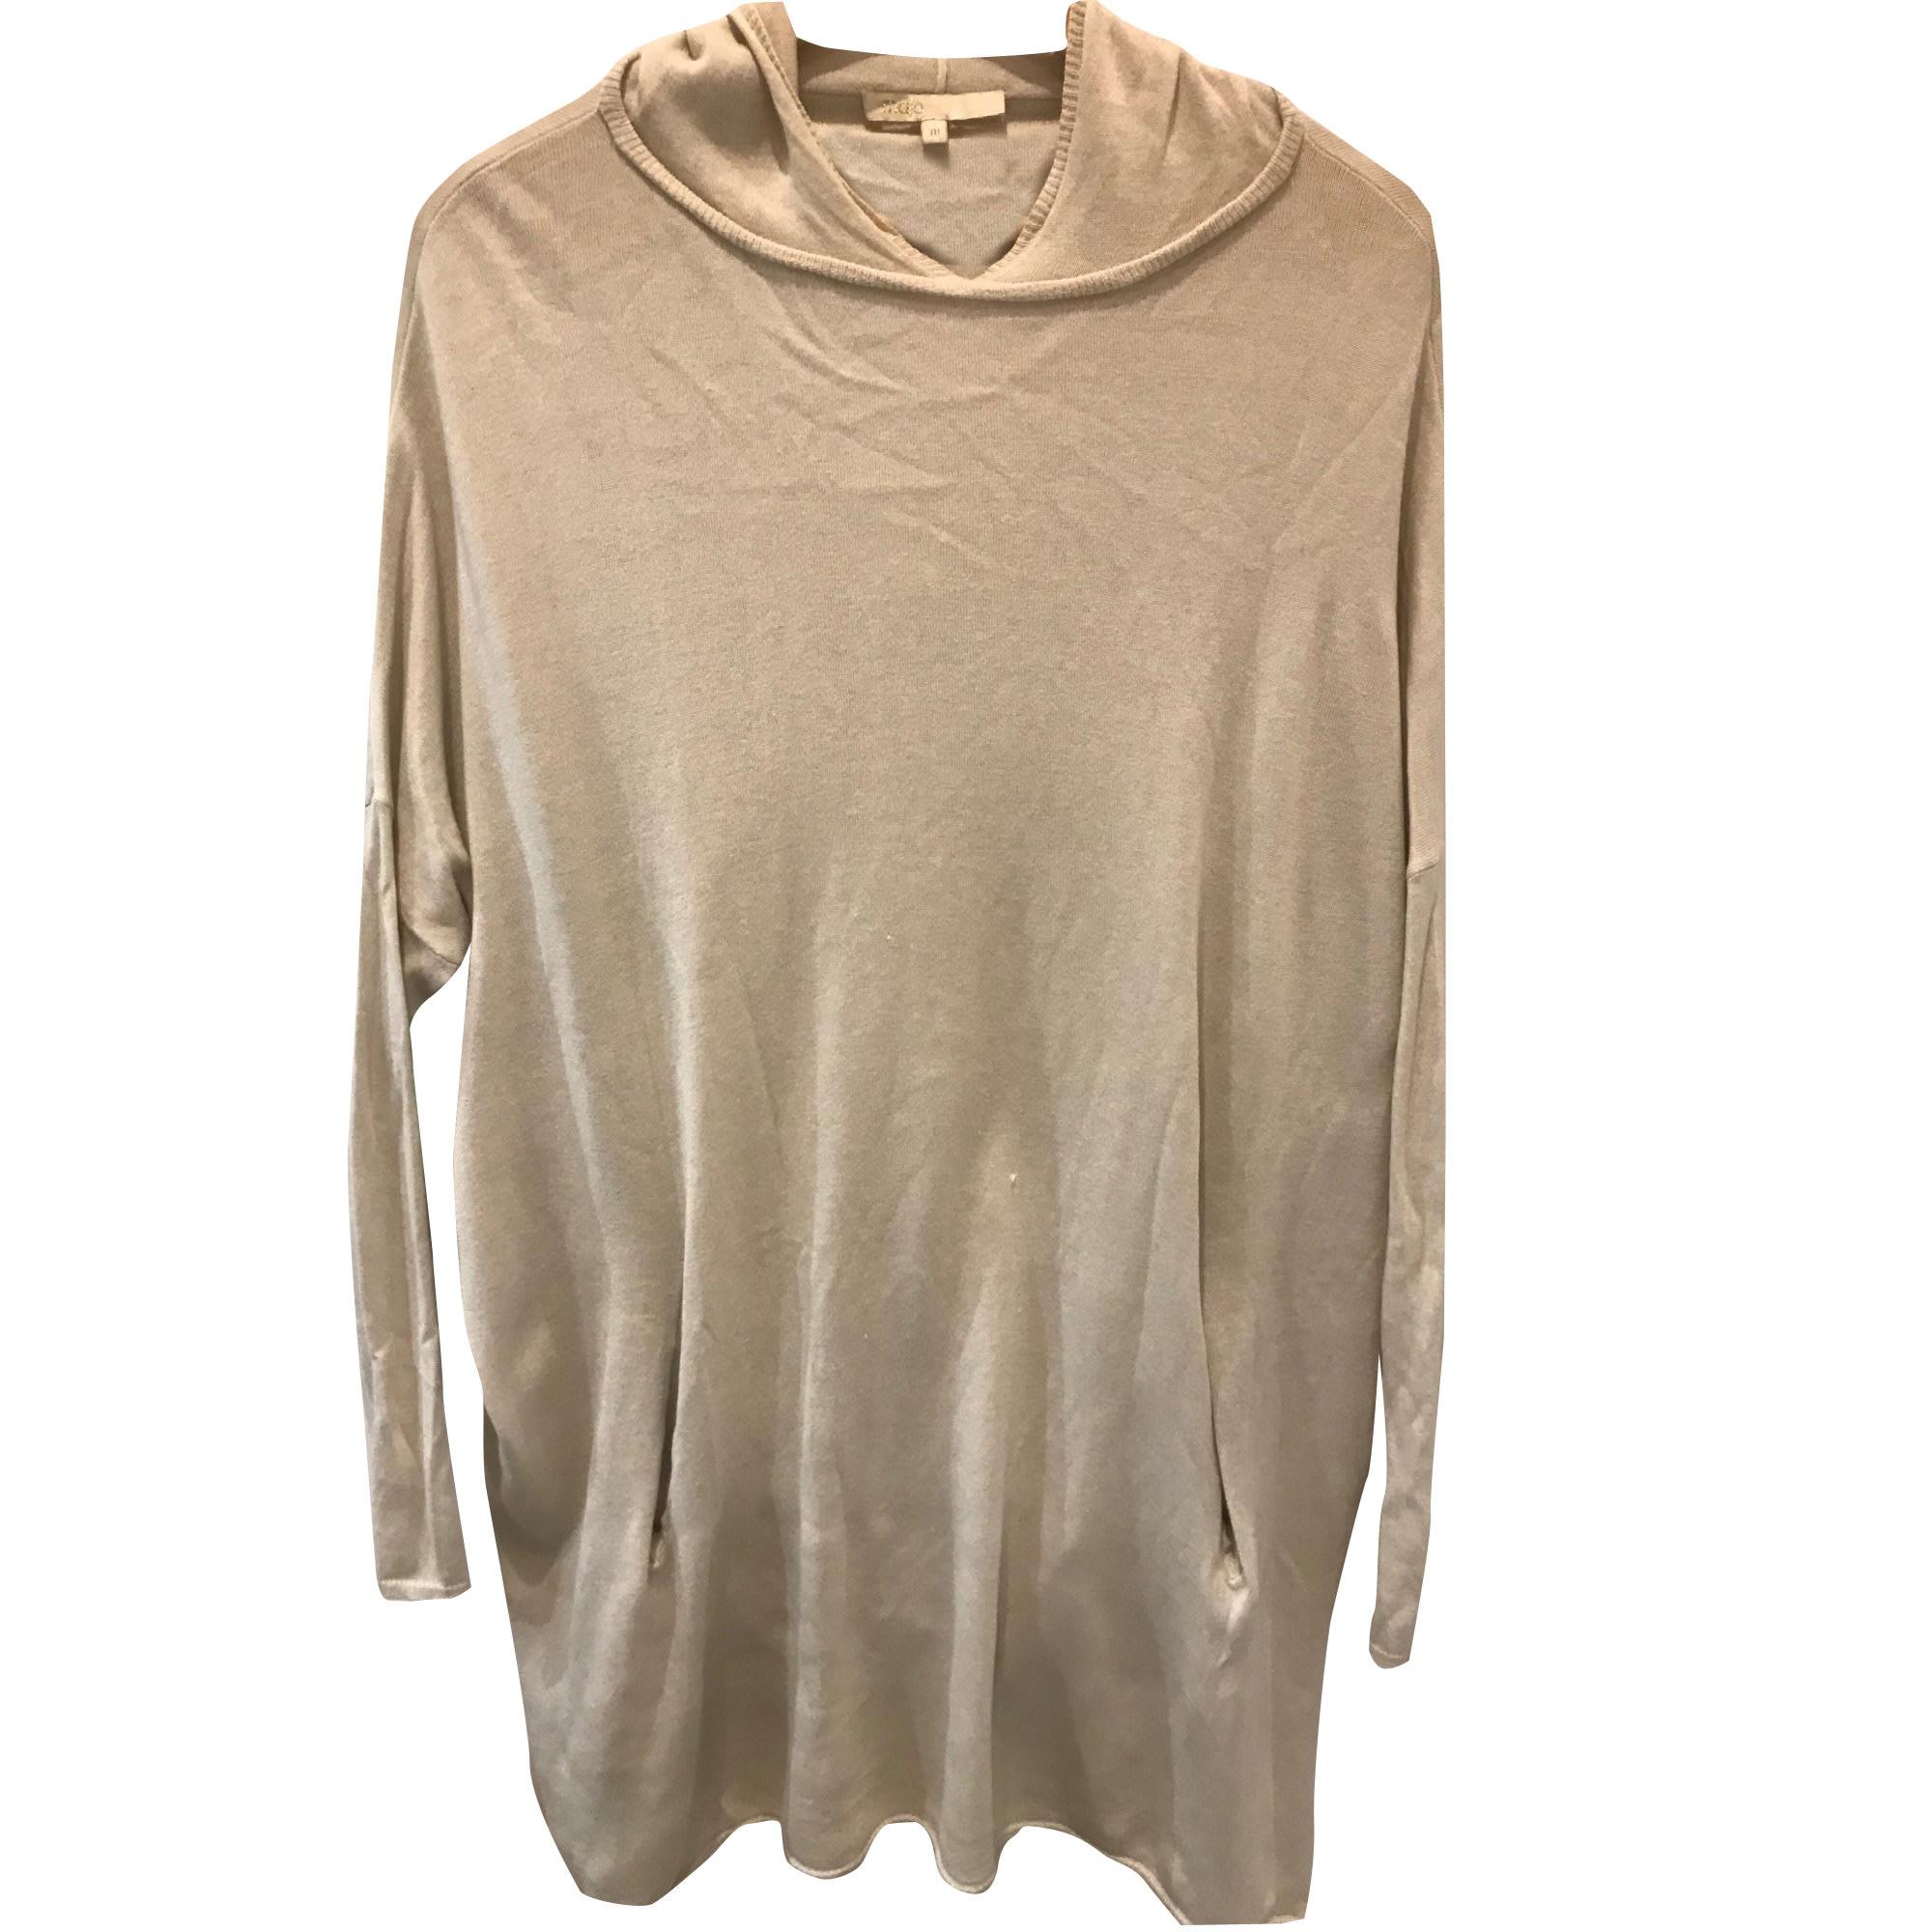 Maje Top, tee-shirt soie Taille unique